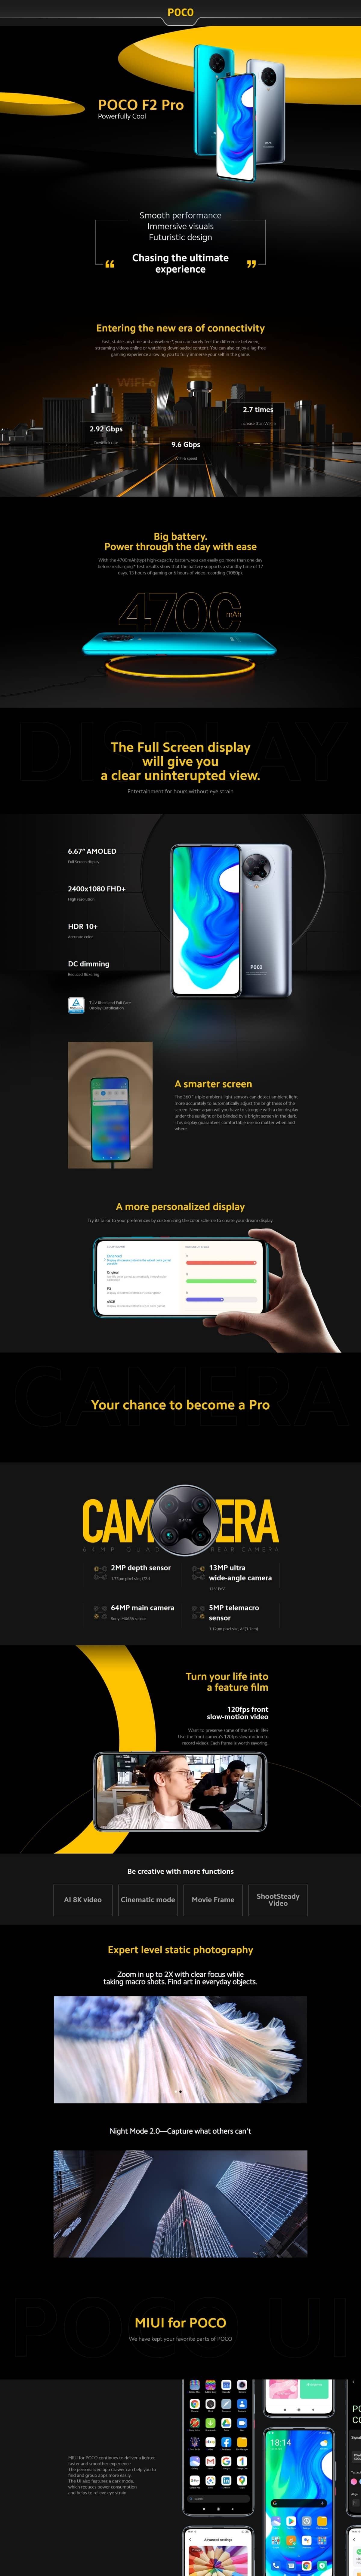 Xiaomi-POCO-F2-Pro5bca00a96e628a63.jpg